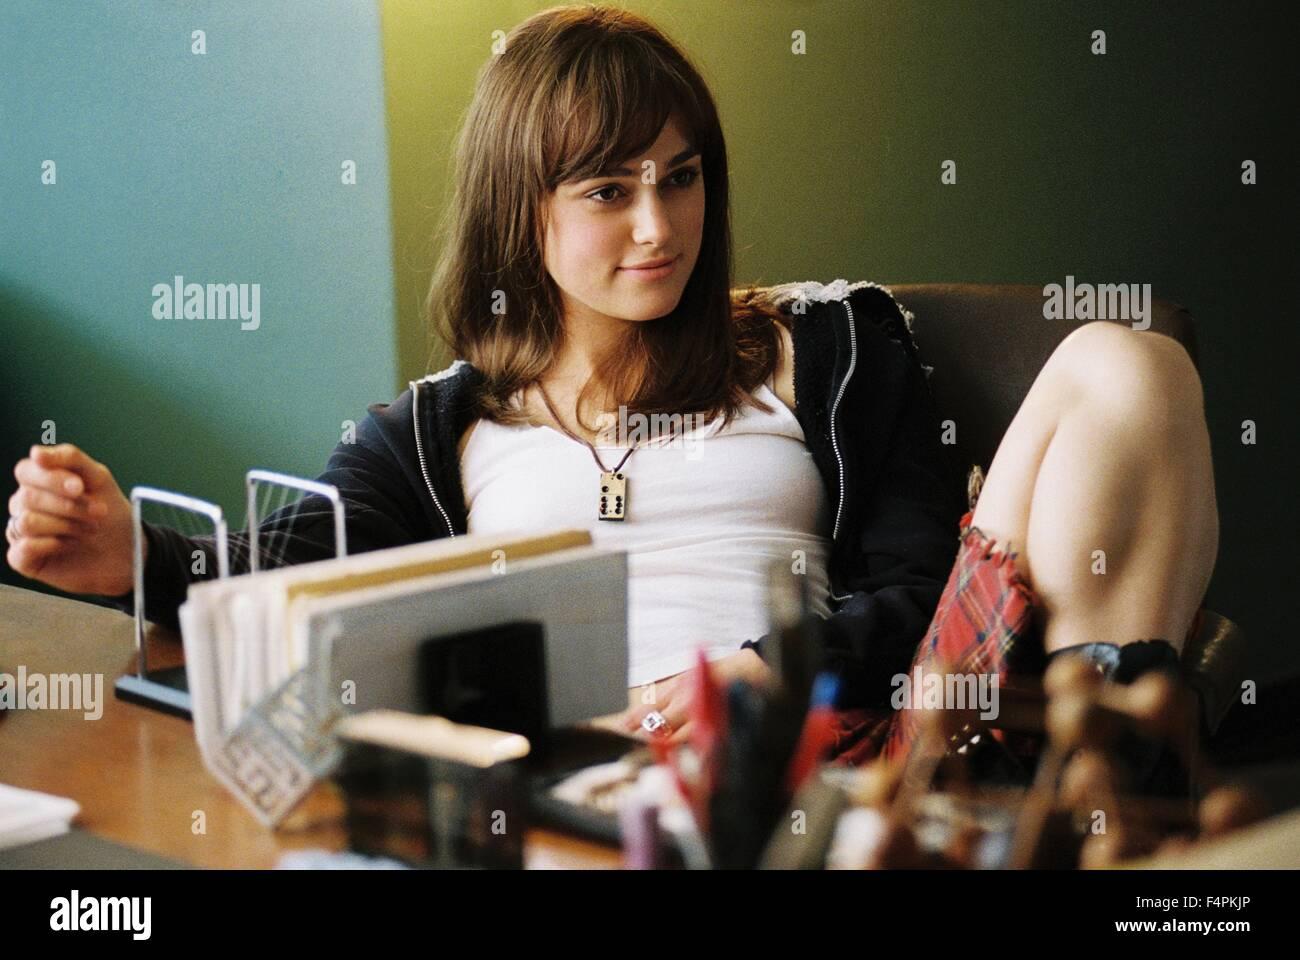 Keira Knightley / Domino / 2005 directed by Tony Scott [New Line Cinema] - Stock Image